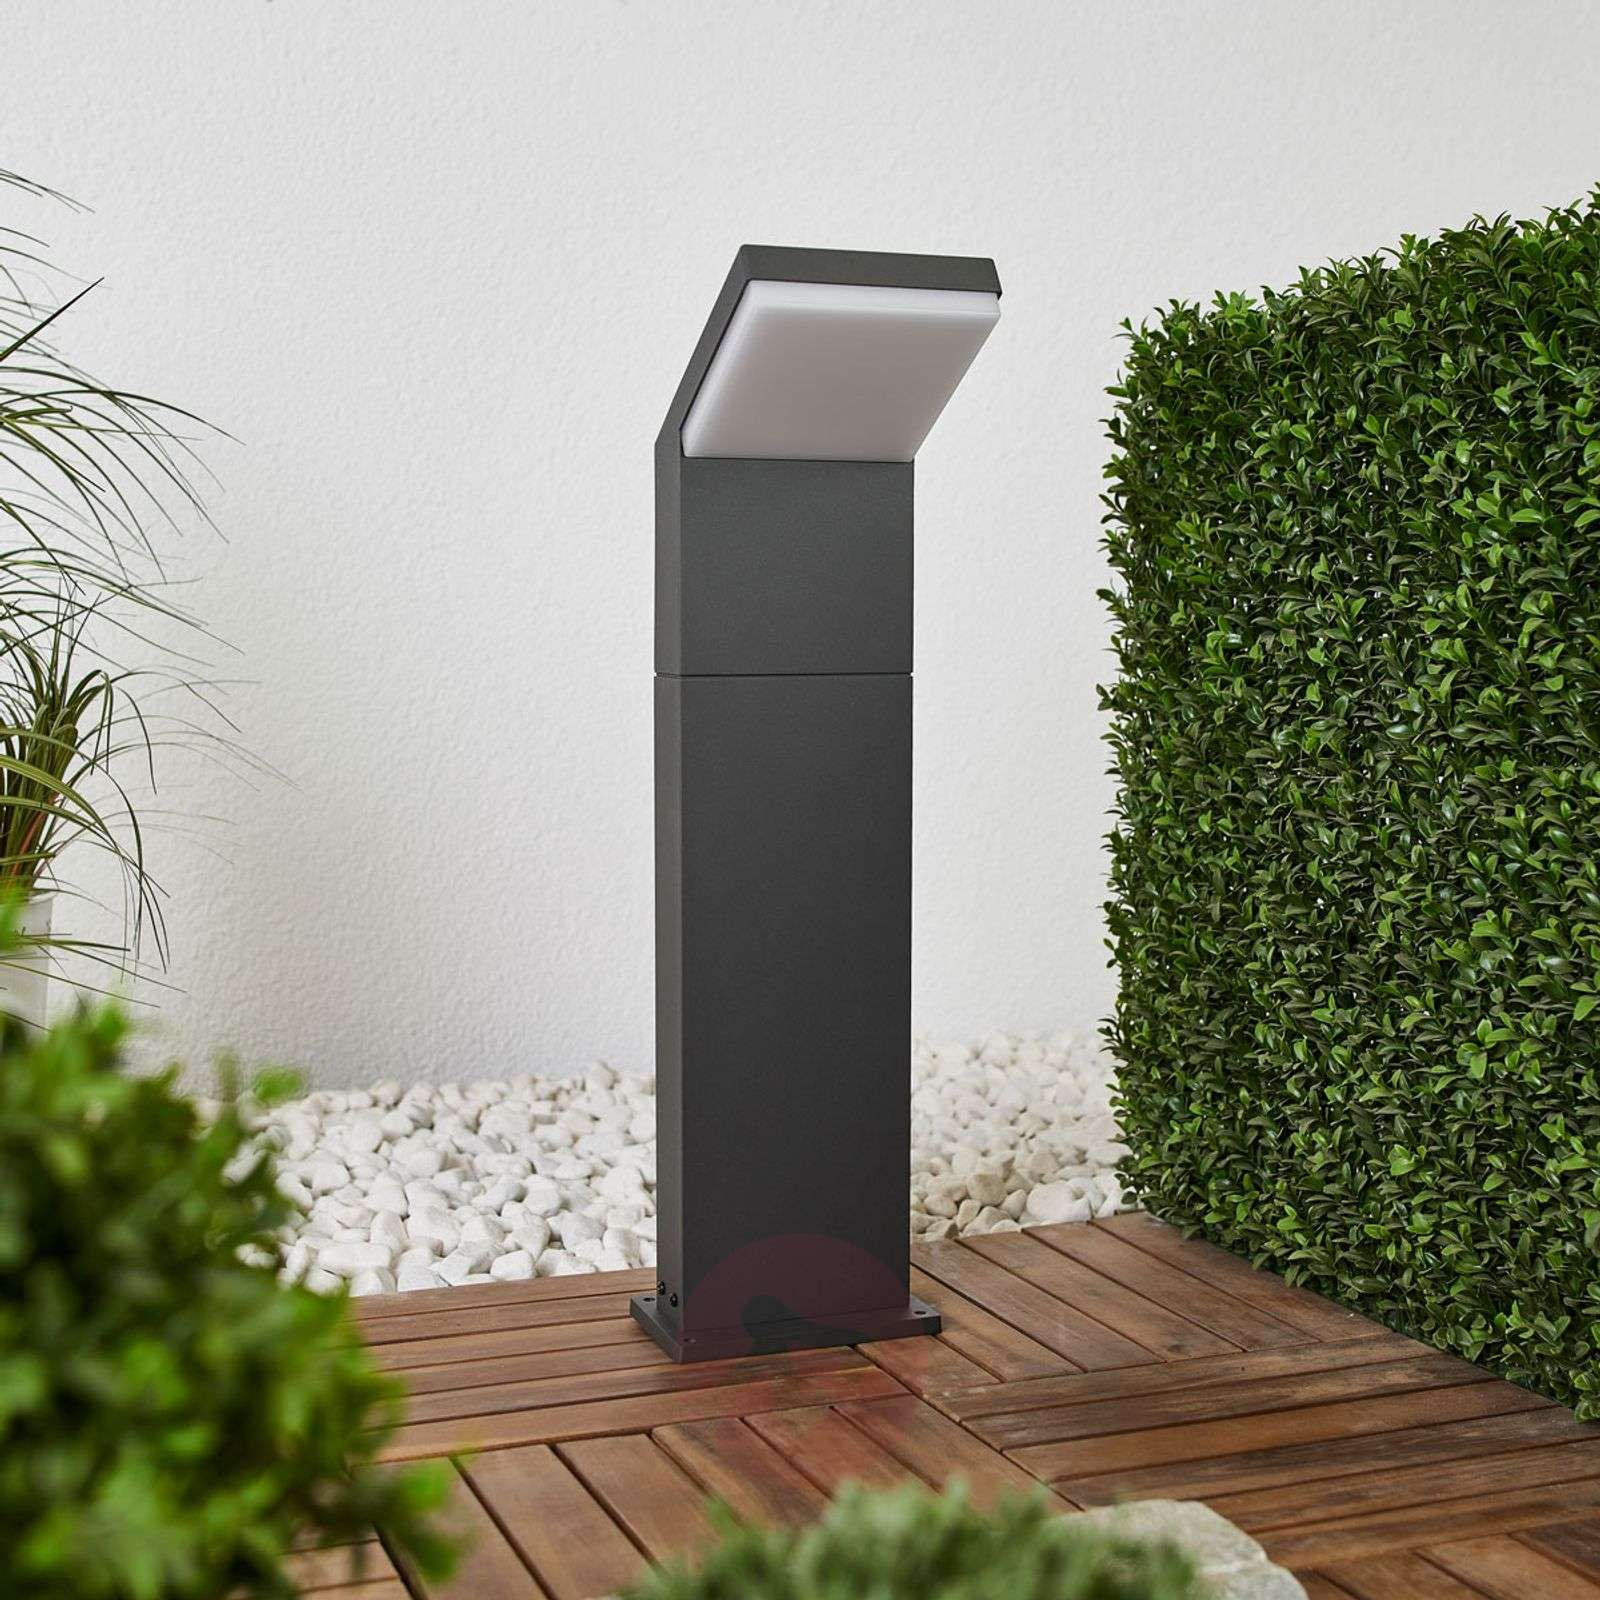 Grafiitinharmaa LED-pylväsvalaisin Yolena, 60 cm